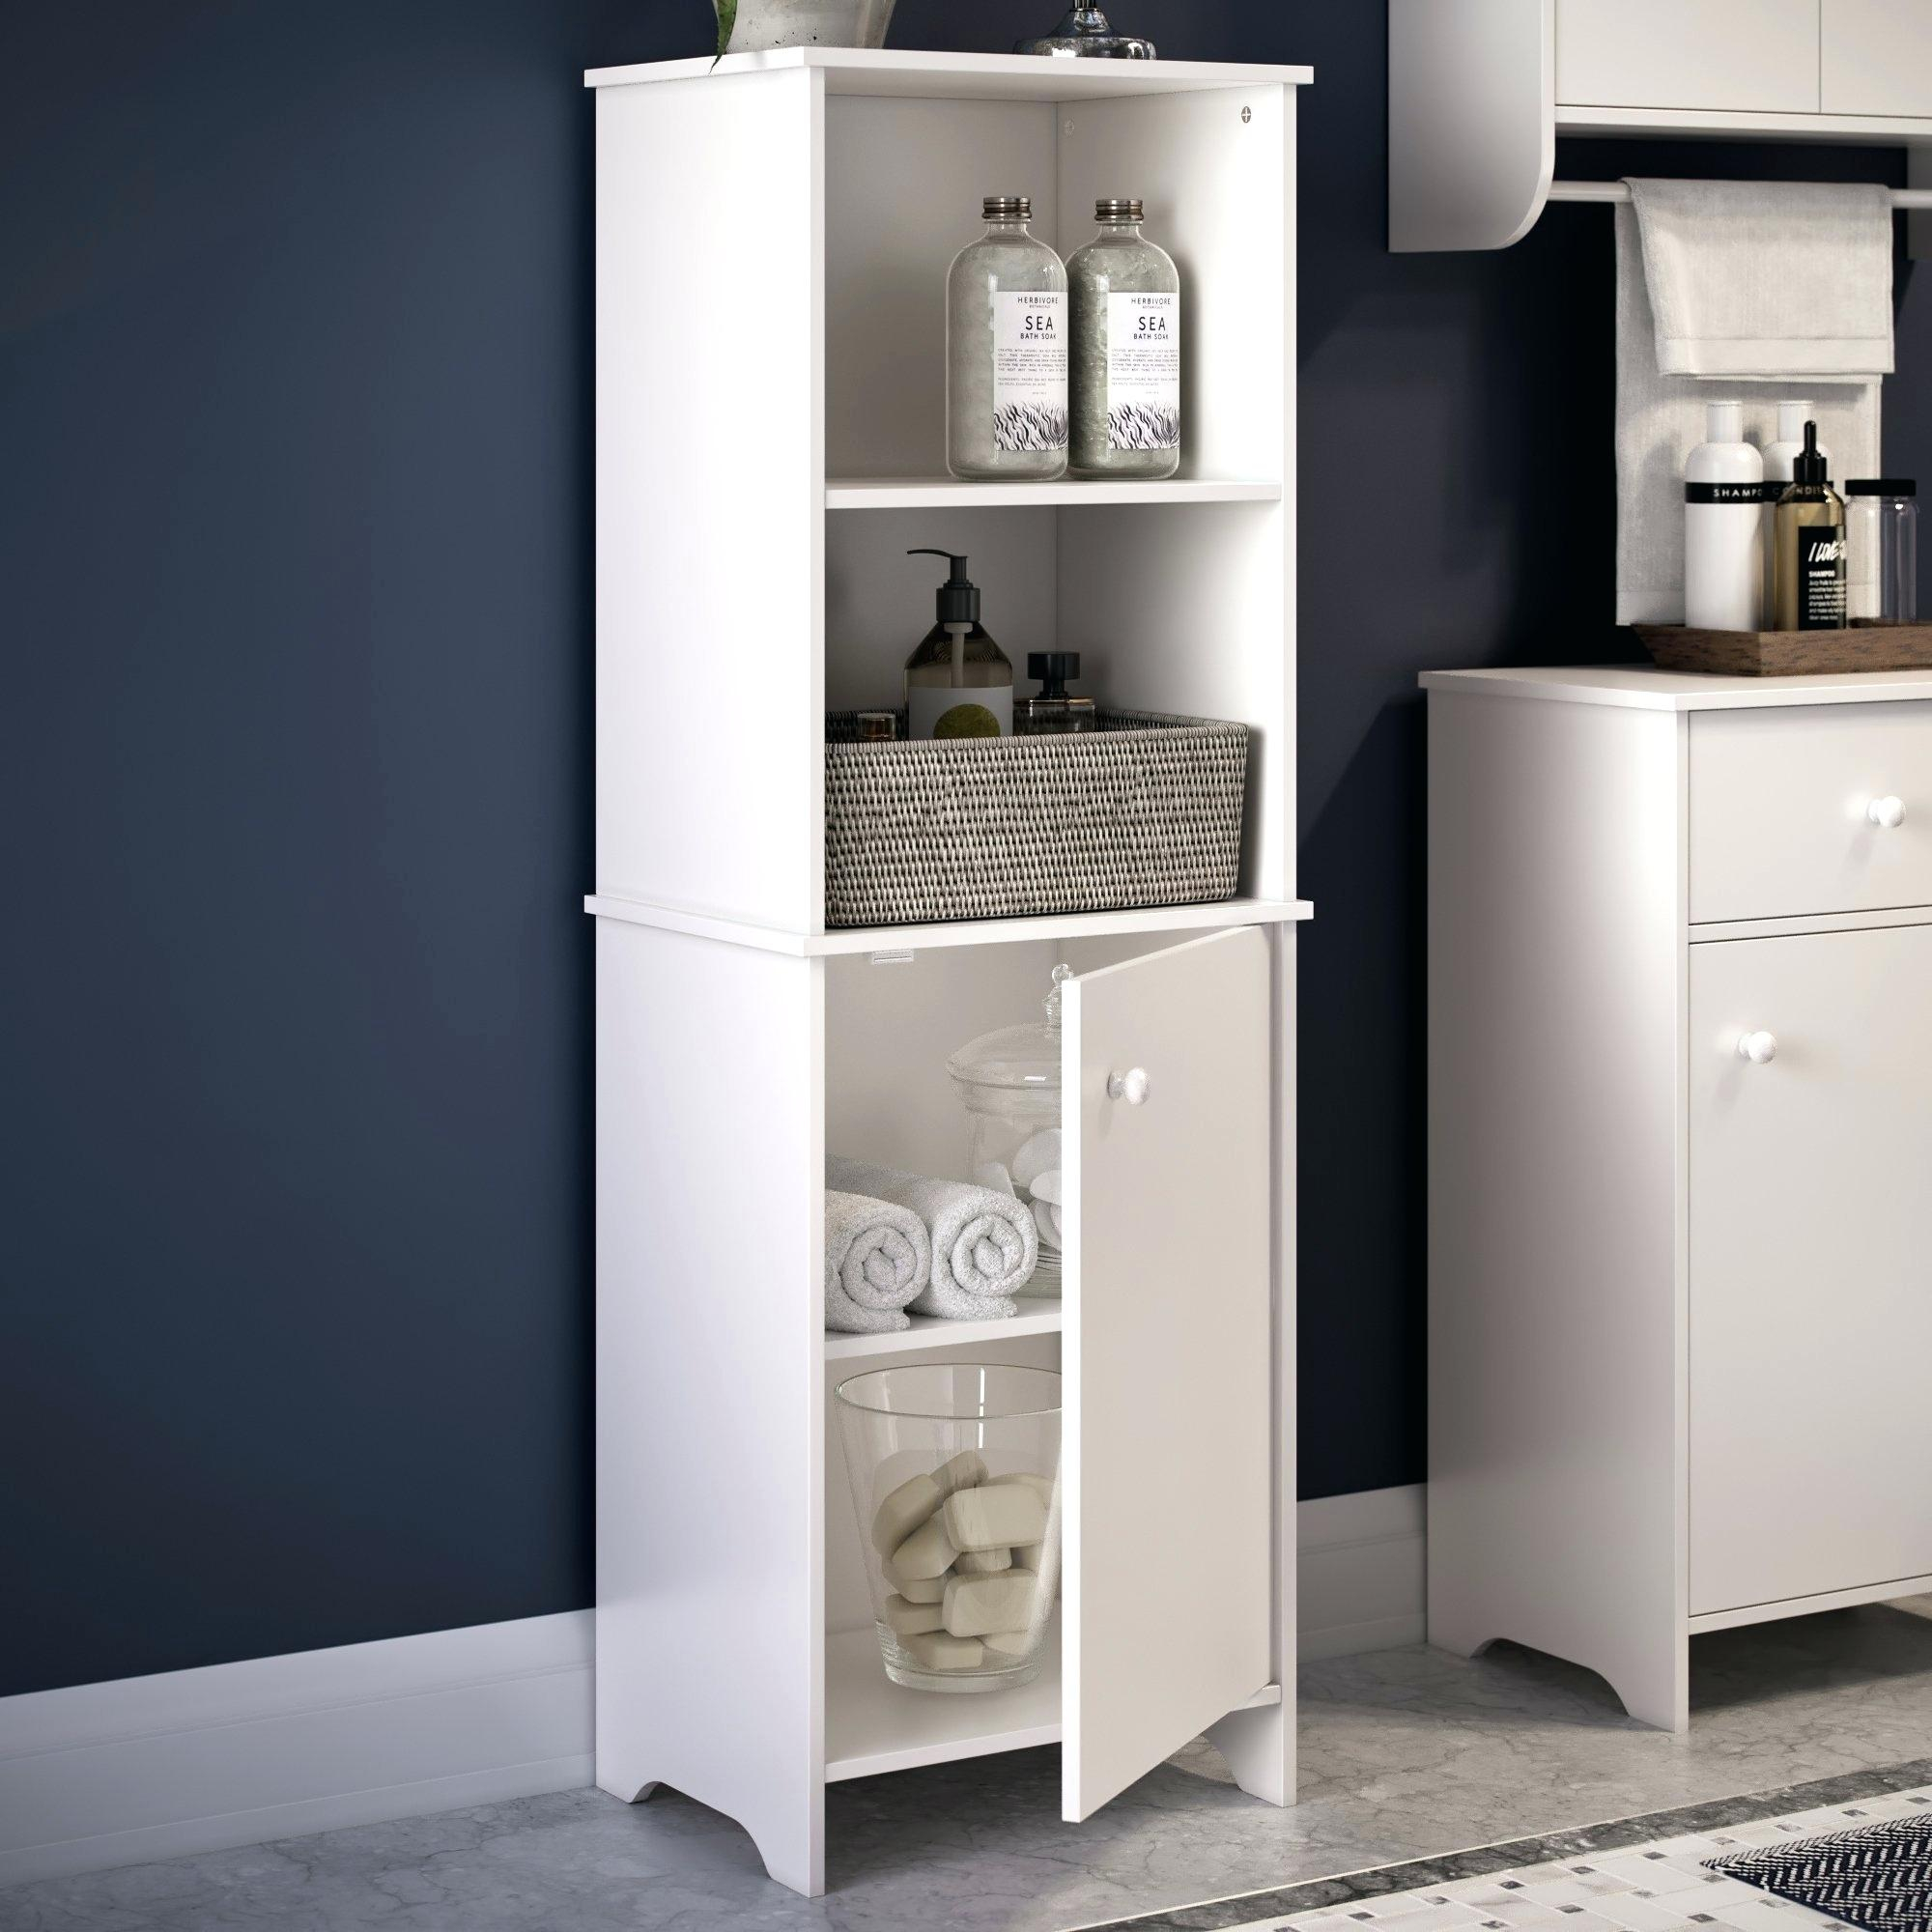 Awesome Bathroom Shelf Furniture Winning Highland House Quality in sizing 2000 X 2000